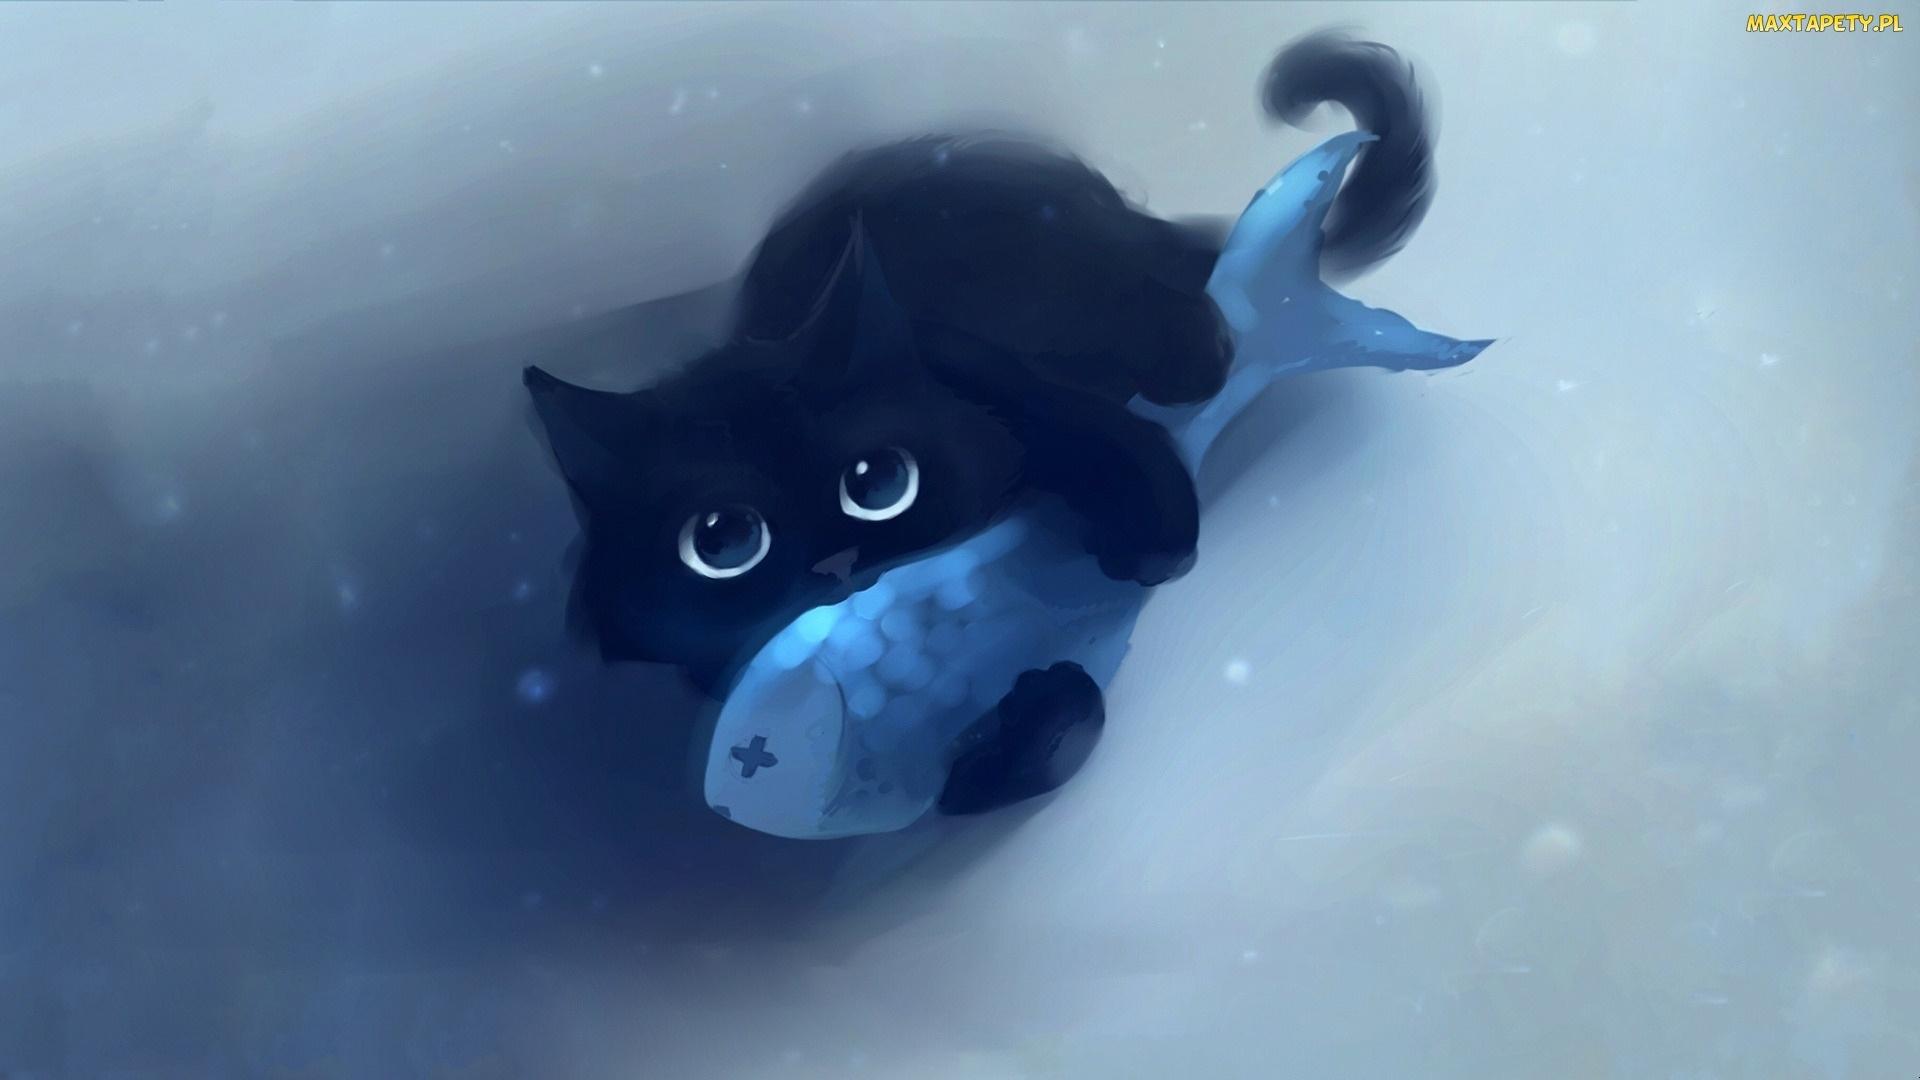 Tapety Zdjęcia Czarny Ryba Kot